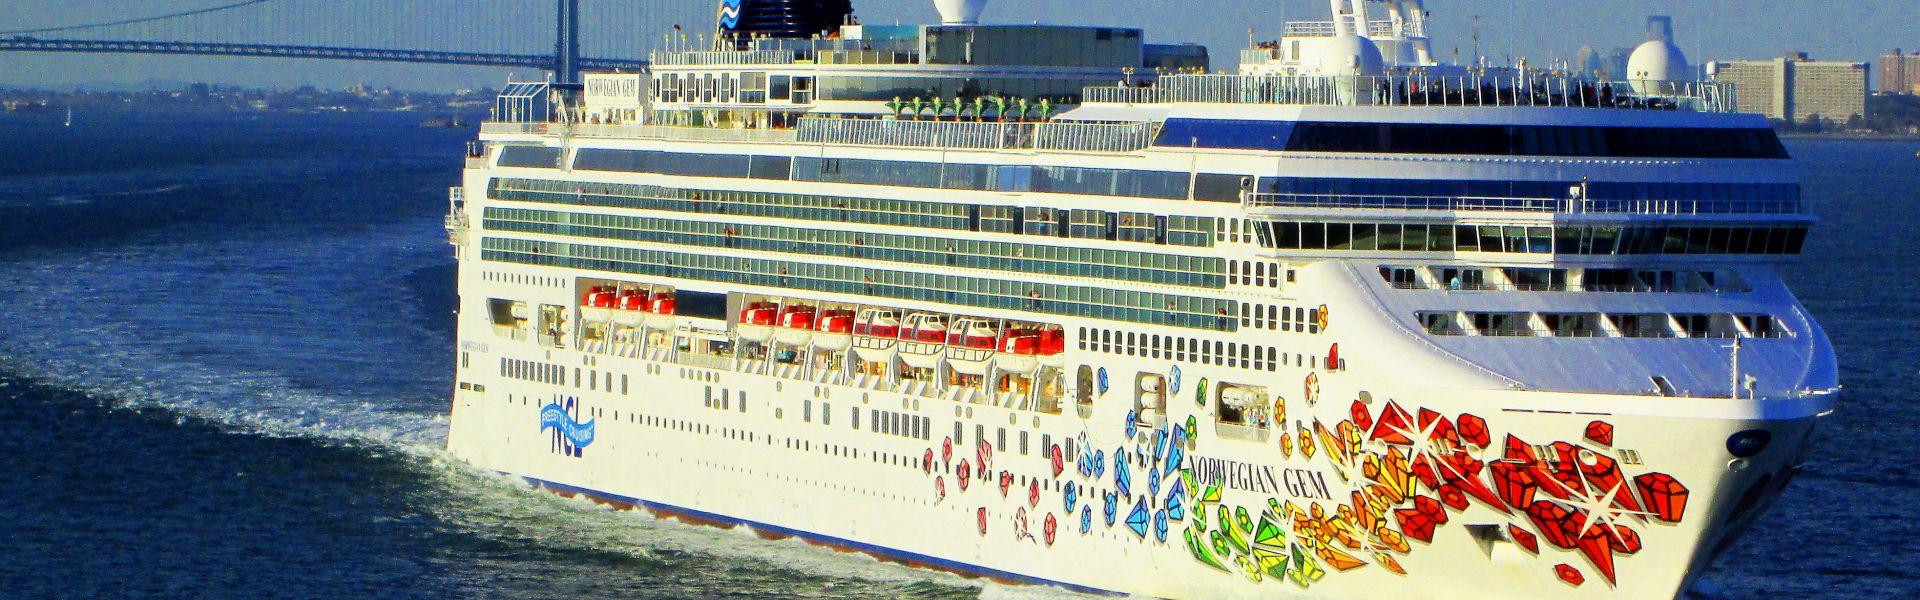 Croaziera 2018 - Bahamas (New York) - Norwegian Cruise Line - Norwegian Gem - 7 nopti